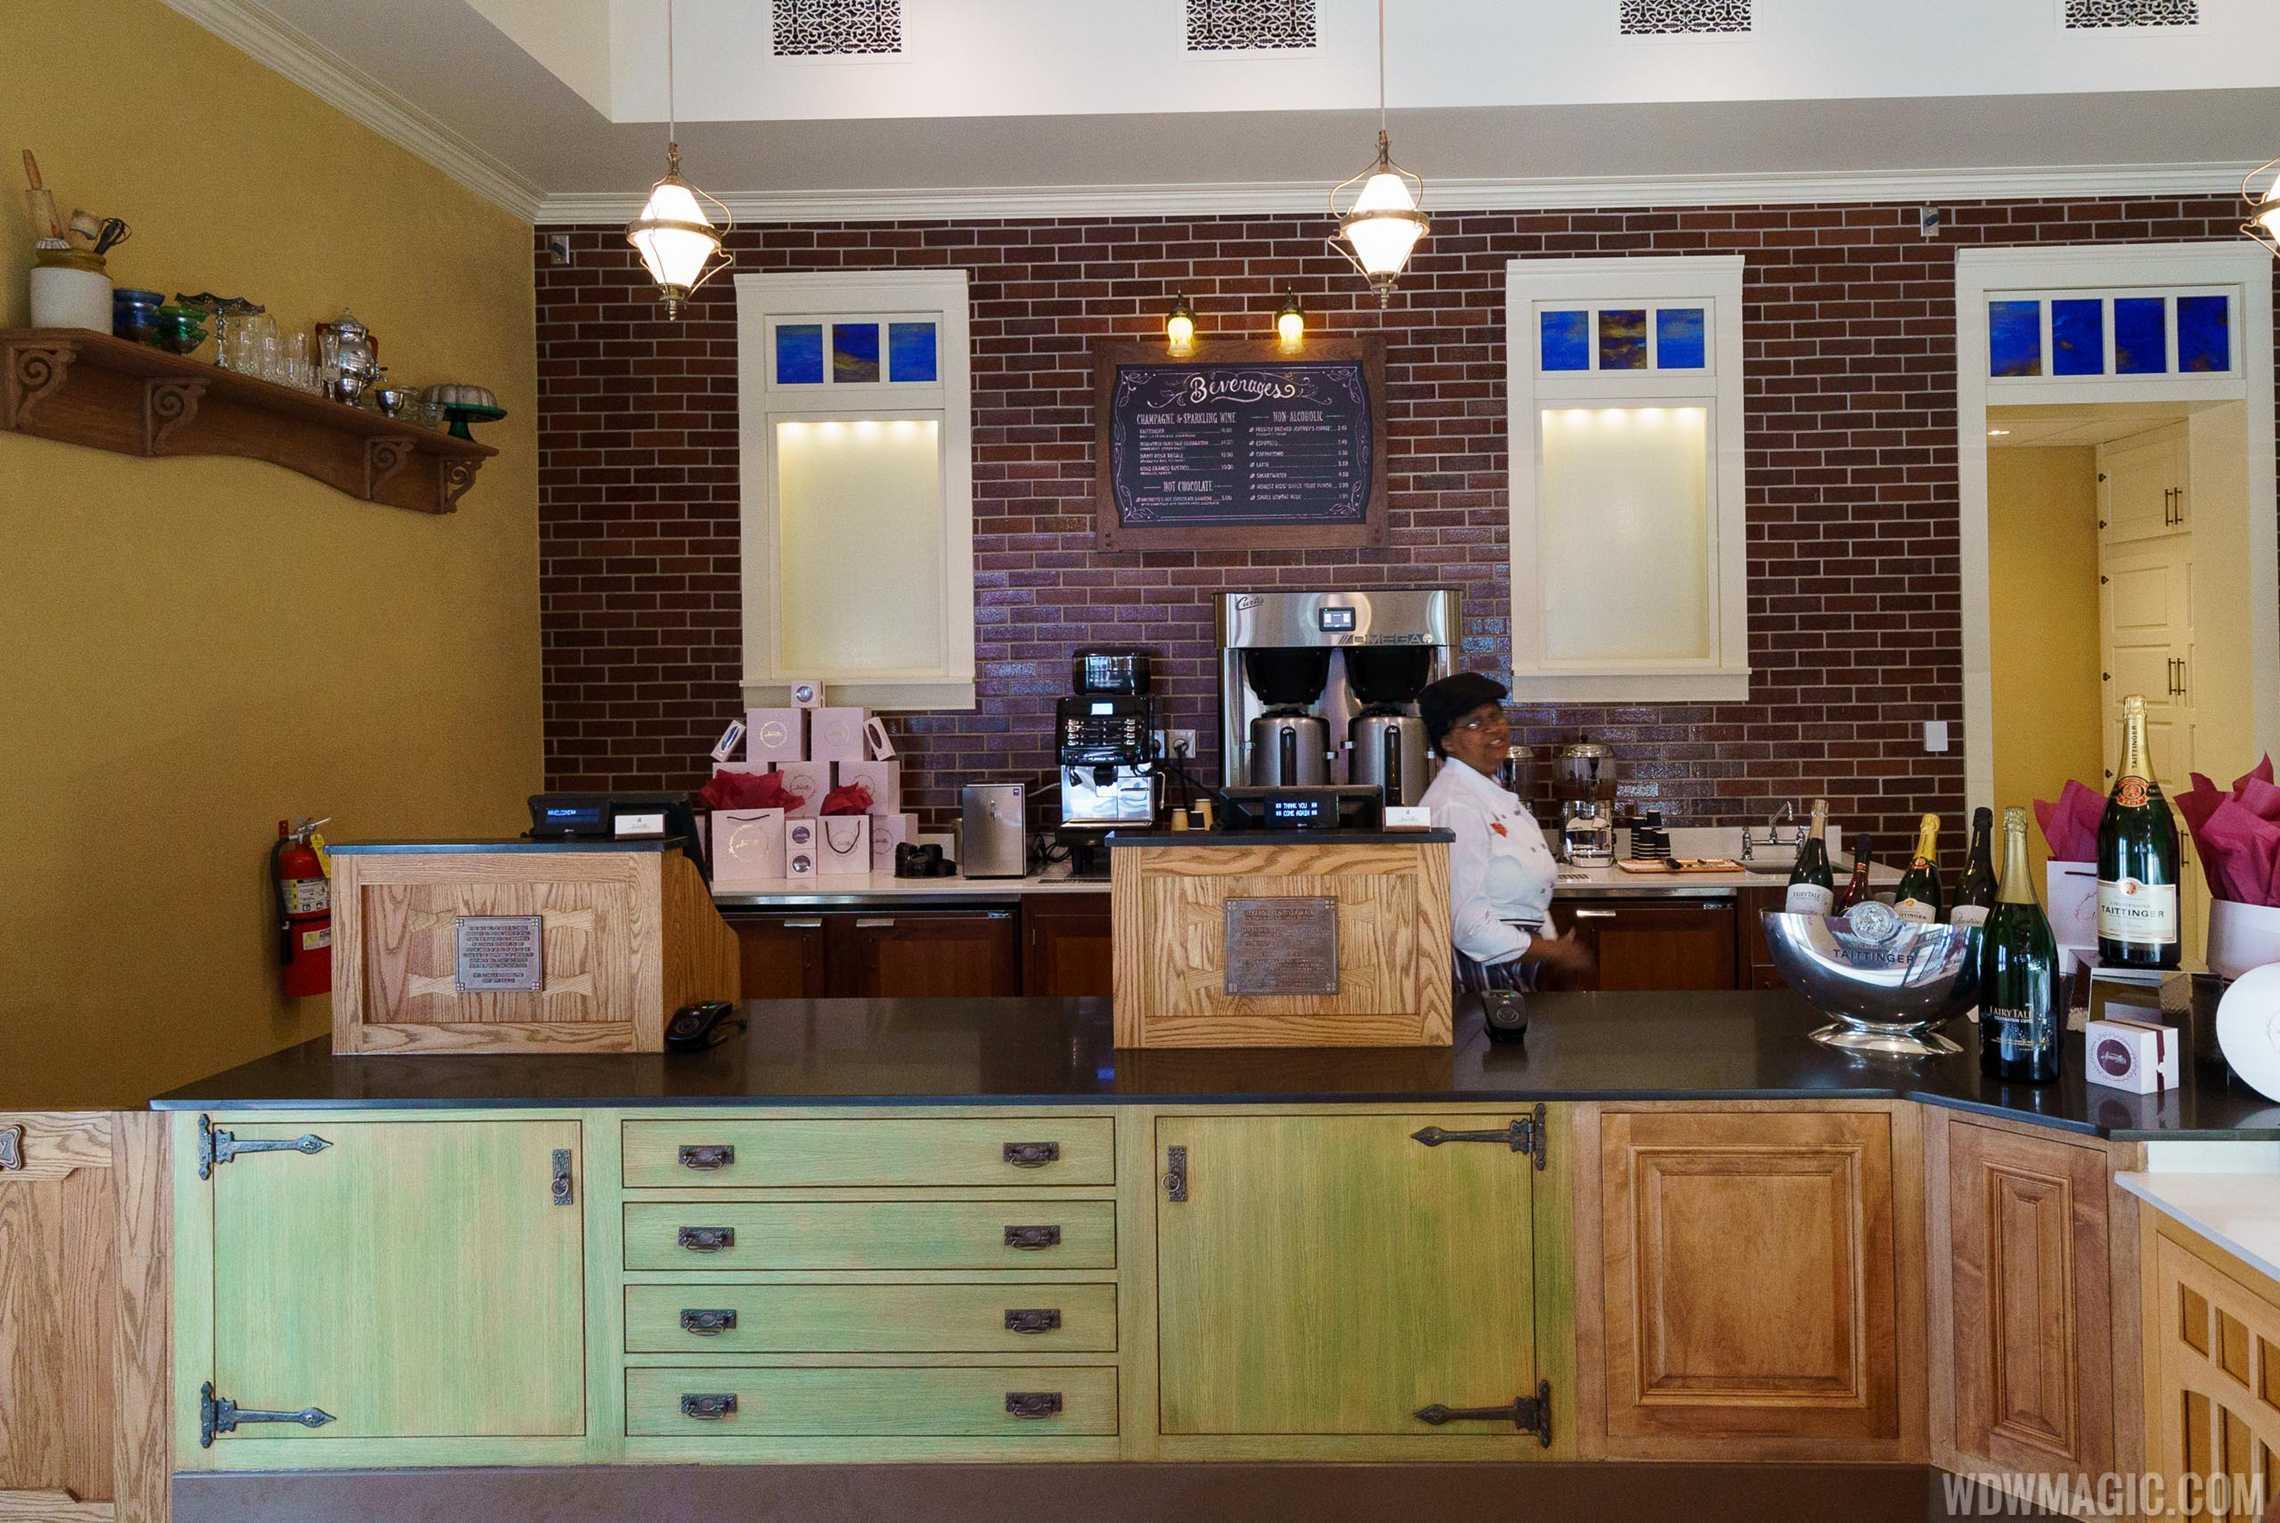 Amorette's Patisserie - Register and beverages